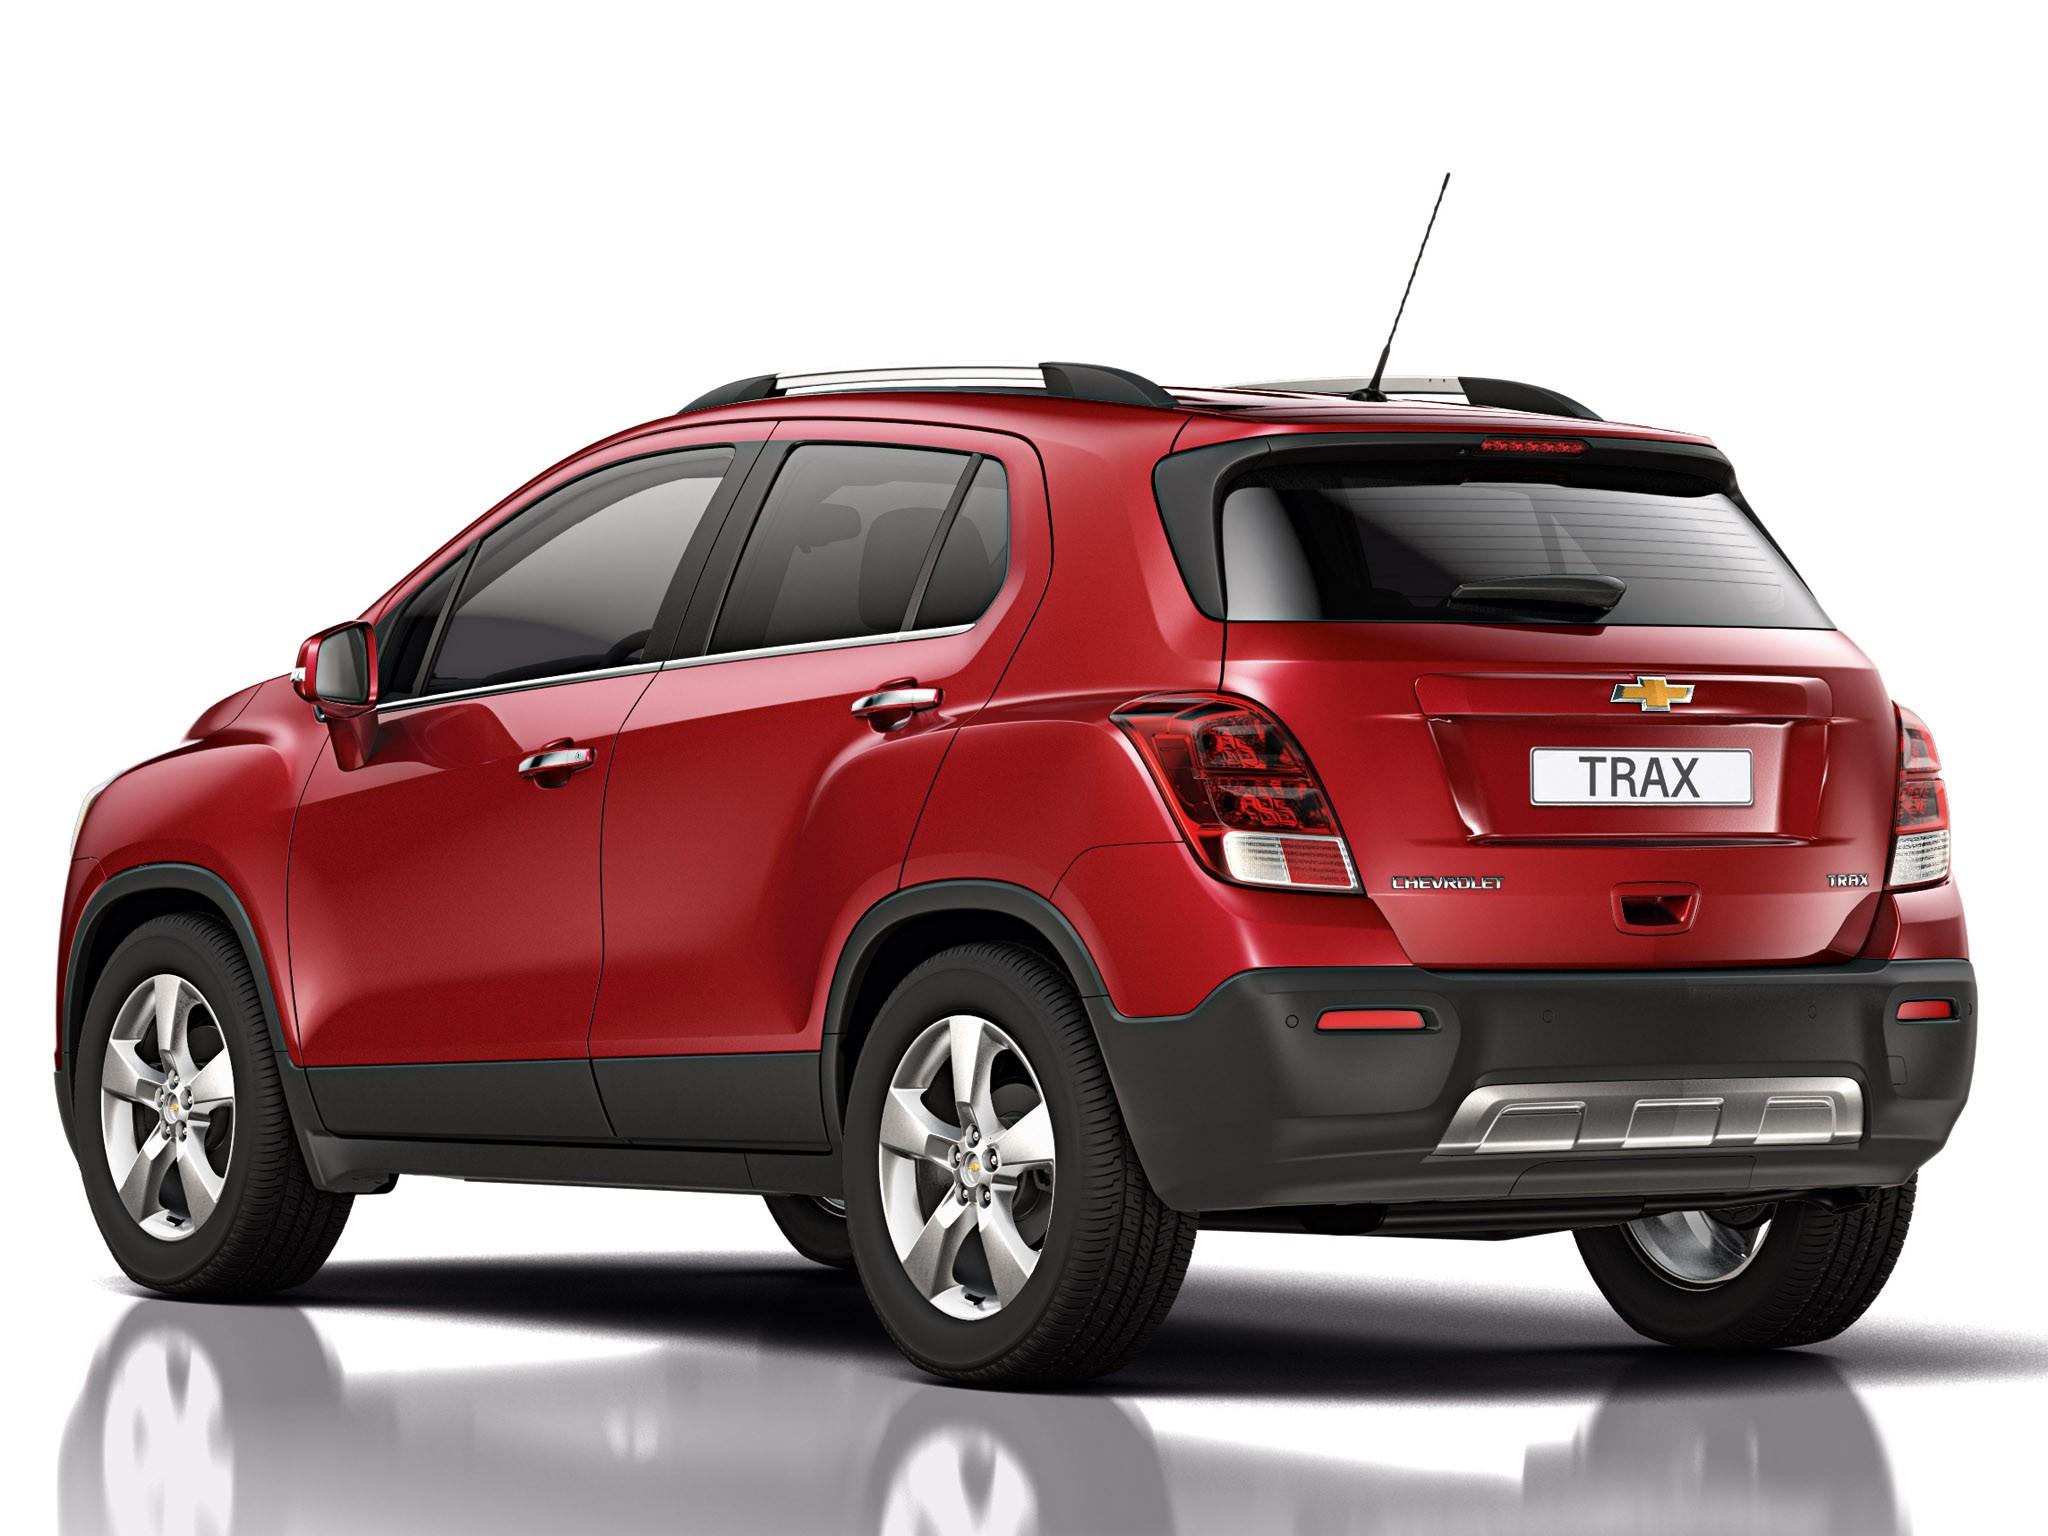 2012 Chevrolet Trax